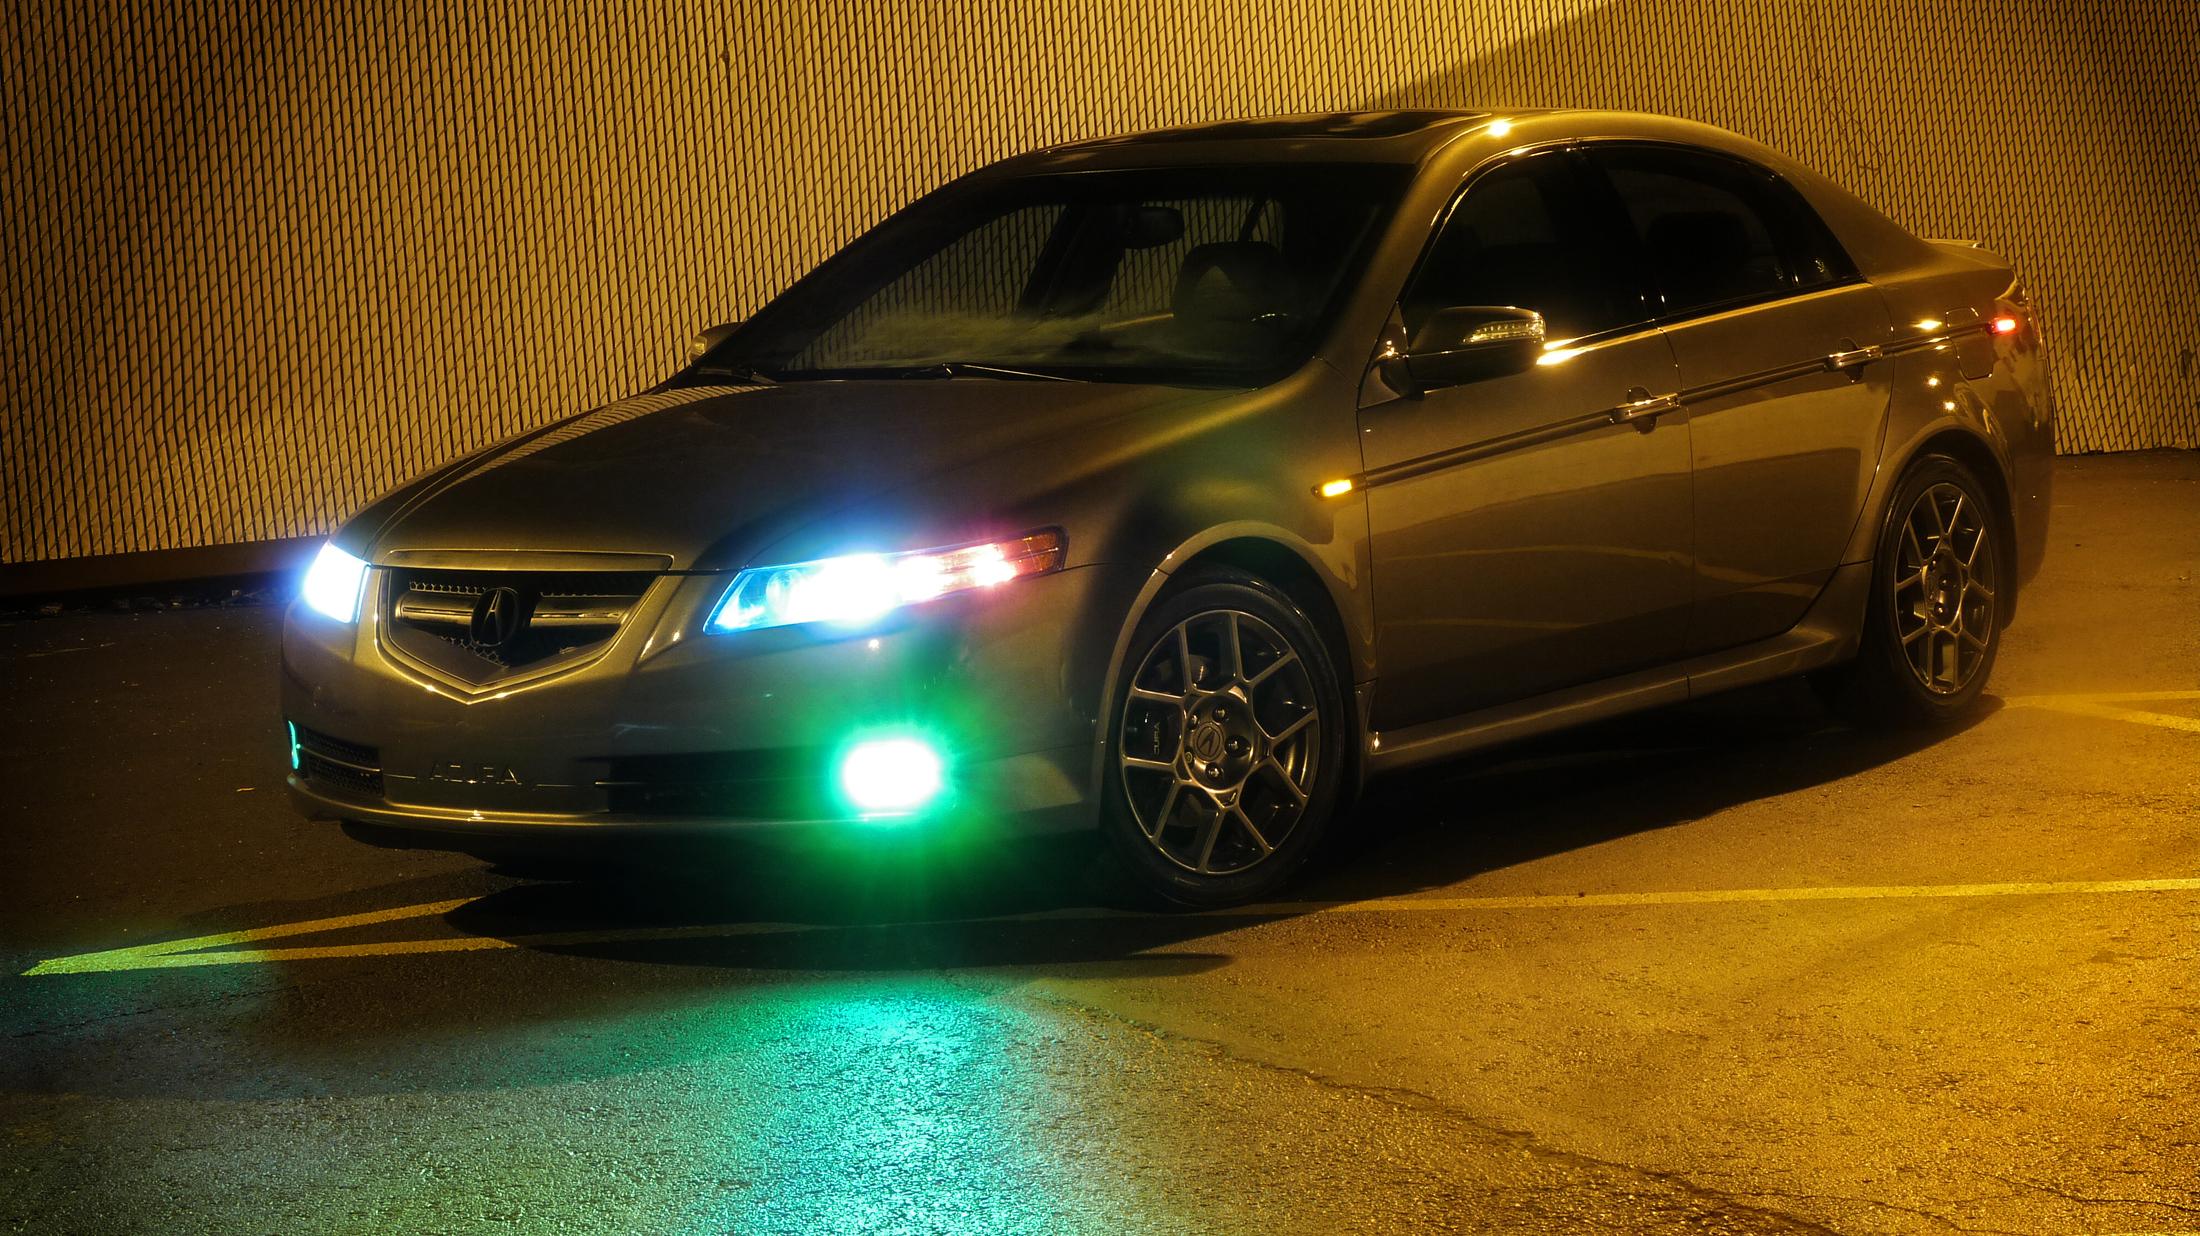 Acura Tl Santa Fe Auto Sound